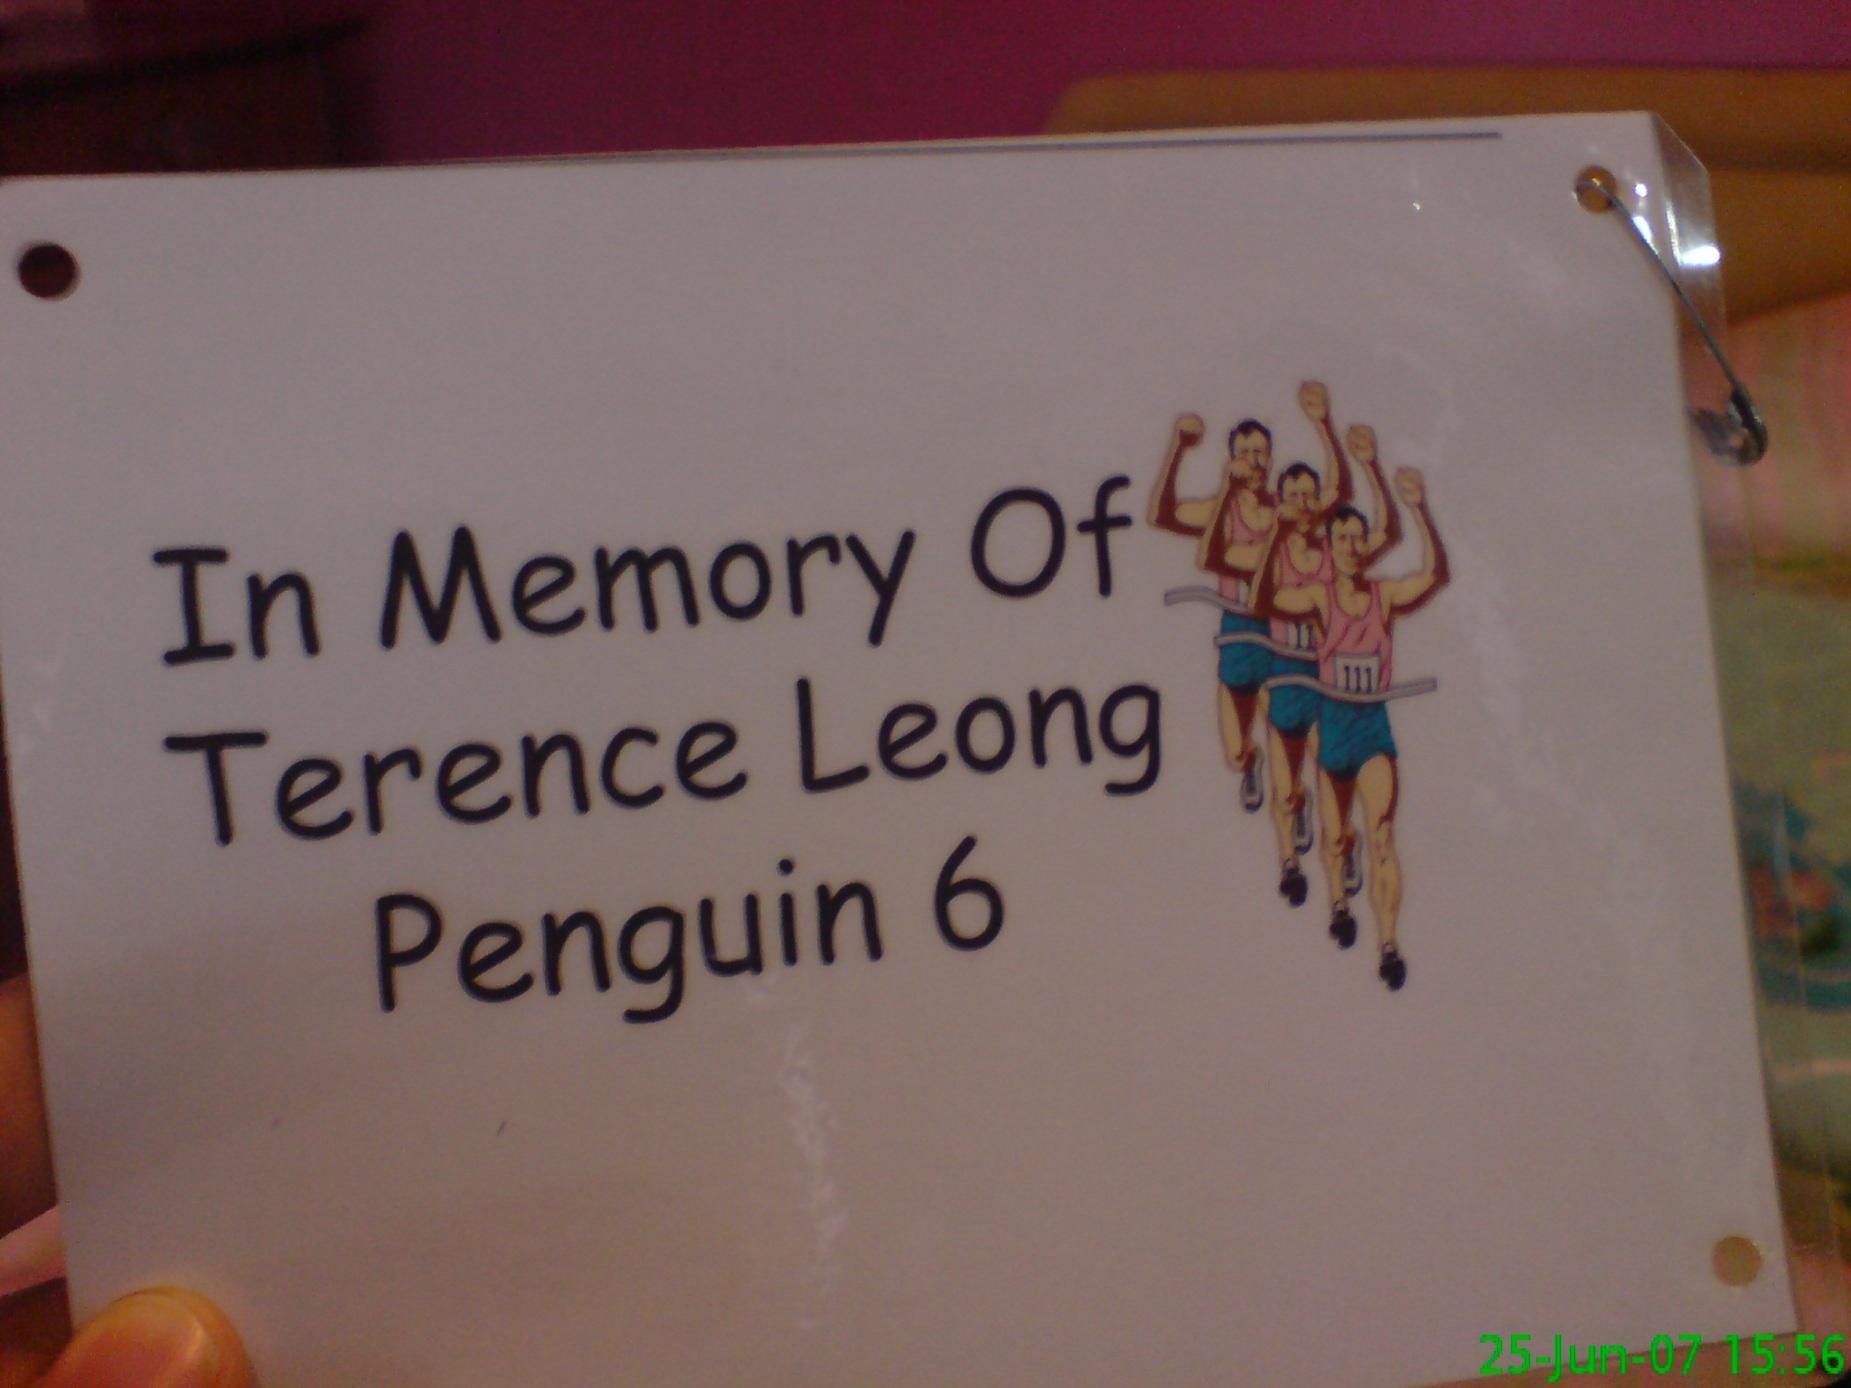 in memory of terenceleong